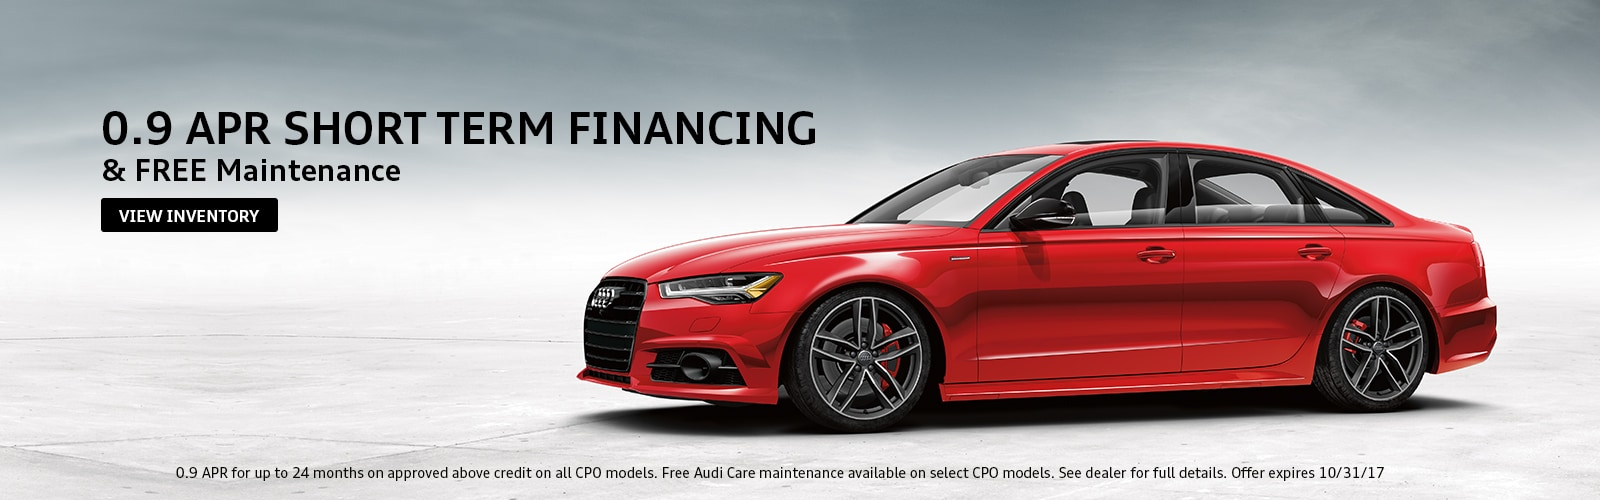 Rusnak Westlake Audi Dealership Oxnard CA New Used Audi Dealers - Southern california audi dealers